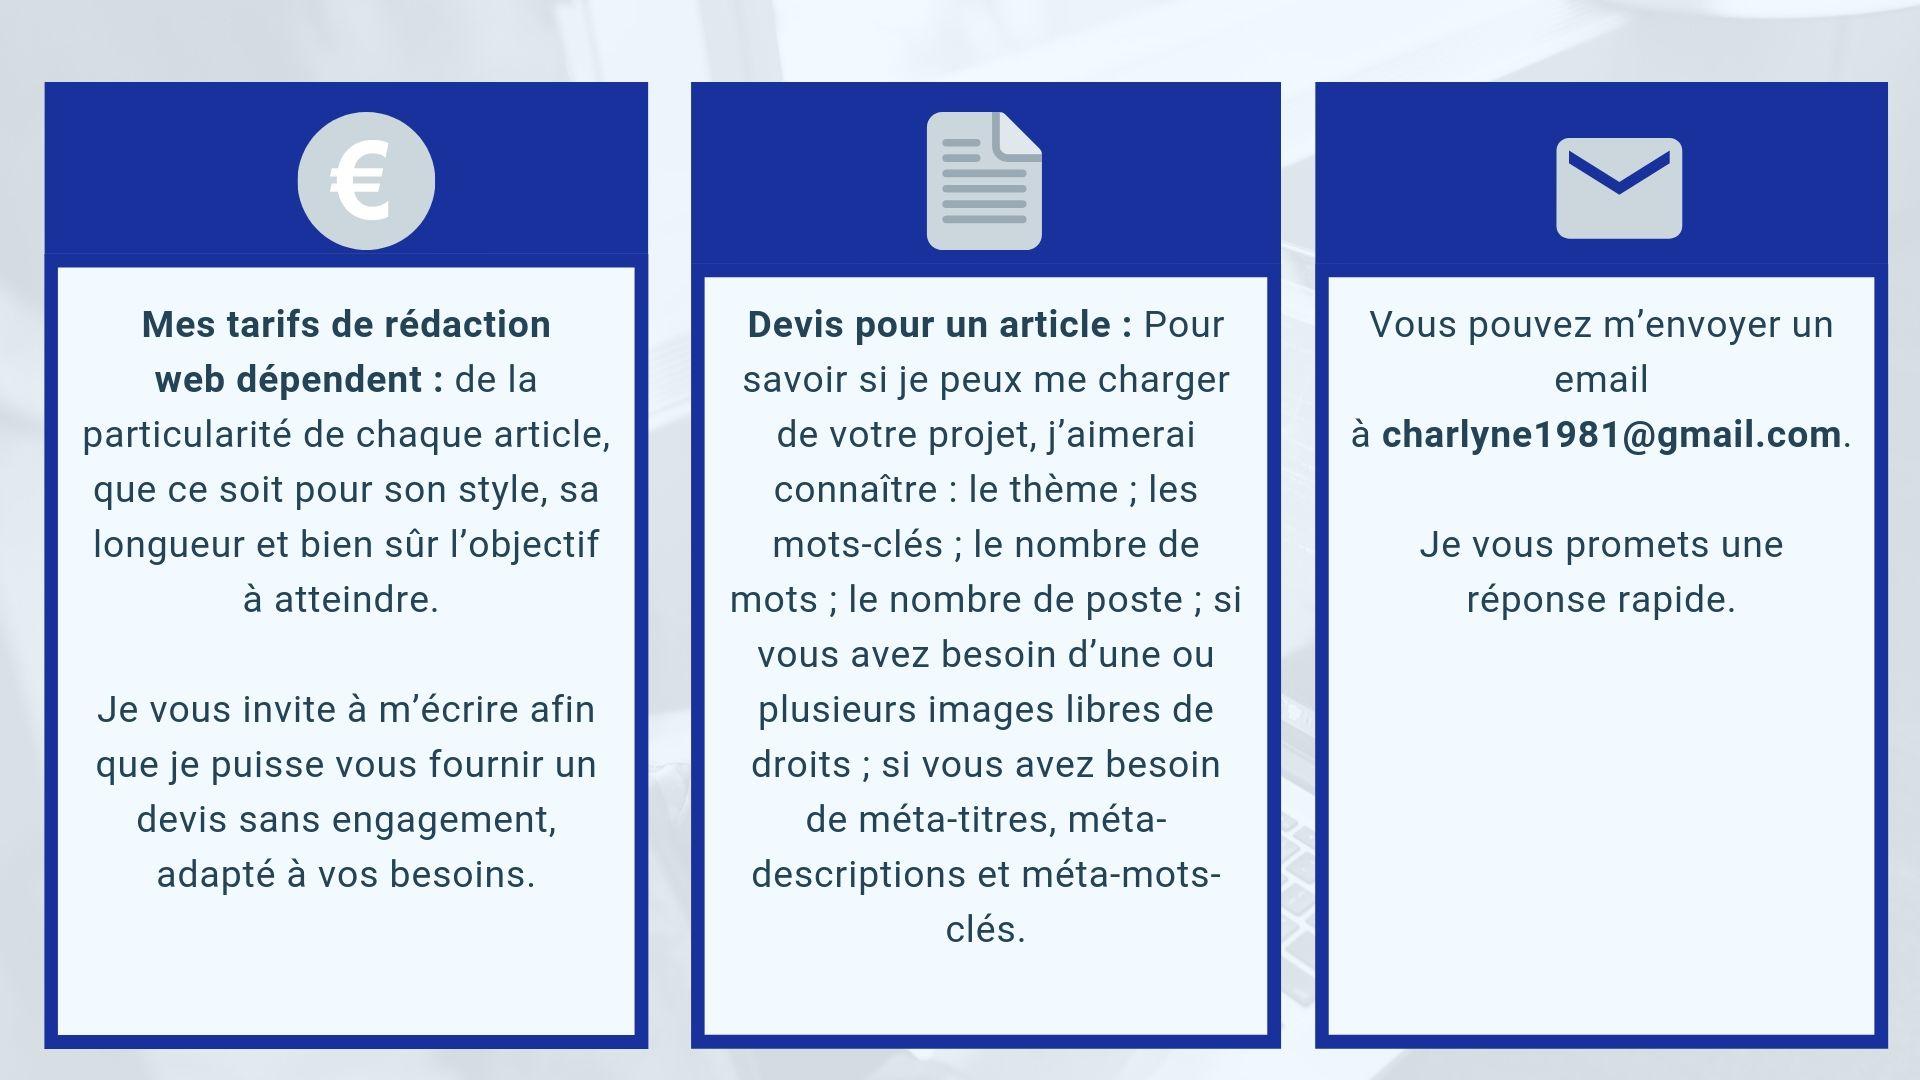 devis-tarifs-redaction-web-blog-articles-textes-redacteur-contact